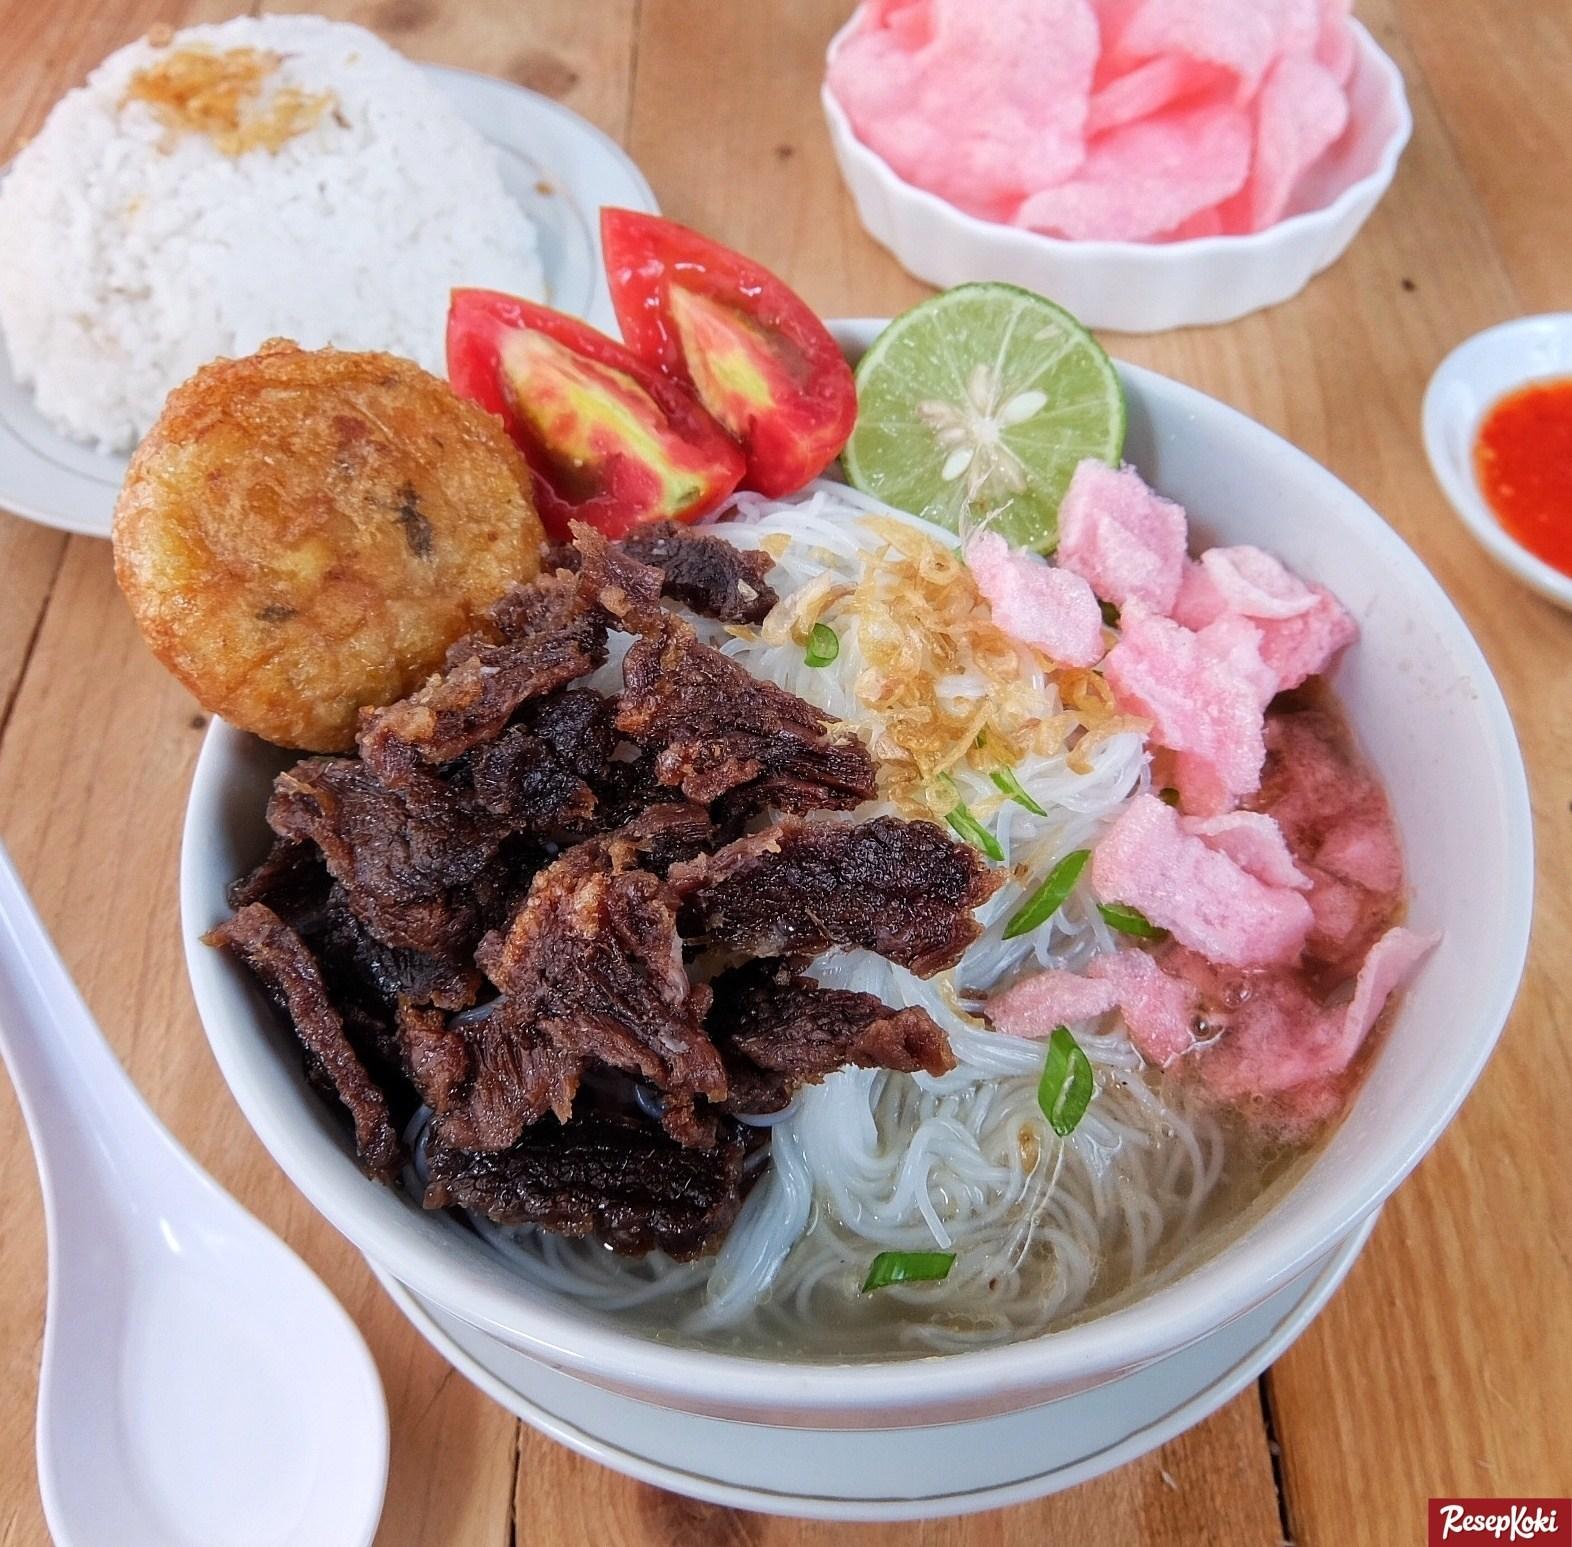 makanan khas padang bikin laper soto padang  mendunia Resepi Kentang Goreng Kunyit Enak dan Mudah